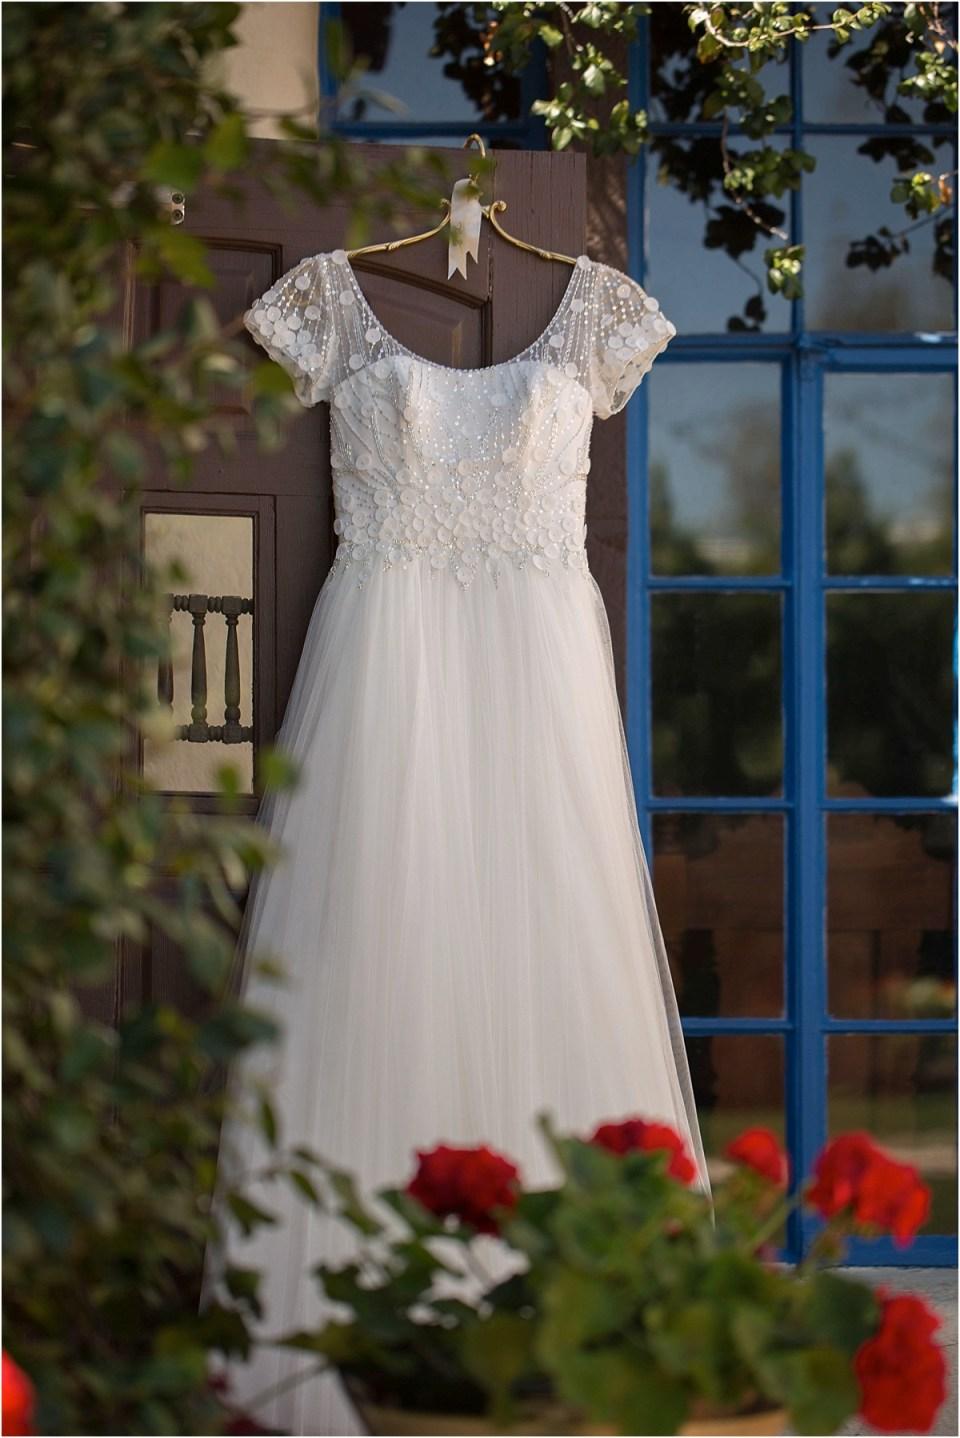 Pronovias Wedding dress from Gigi's Bridal in Tucson, Arizona